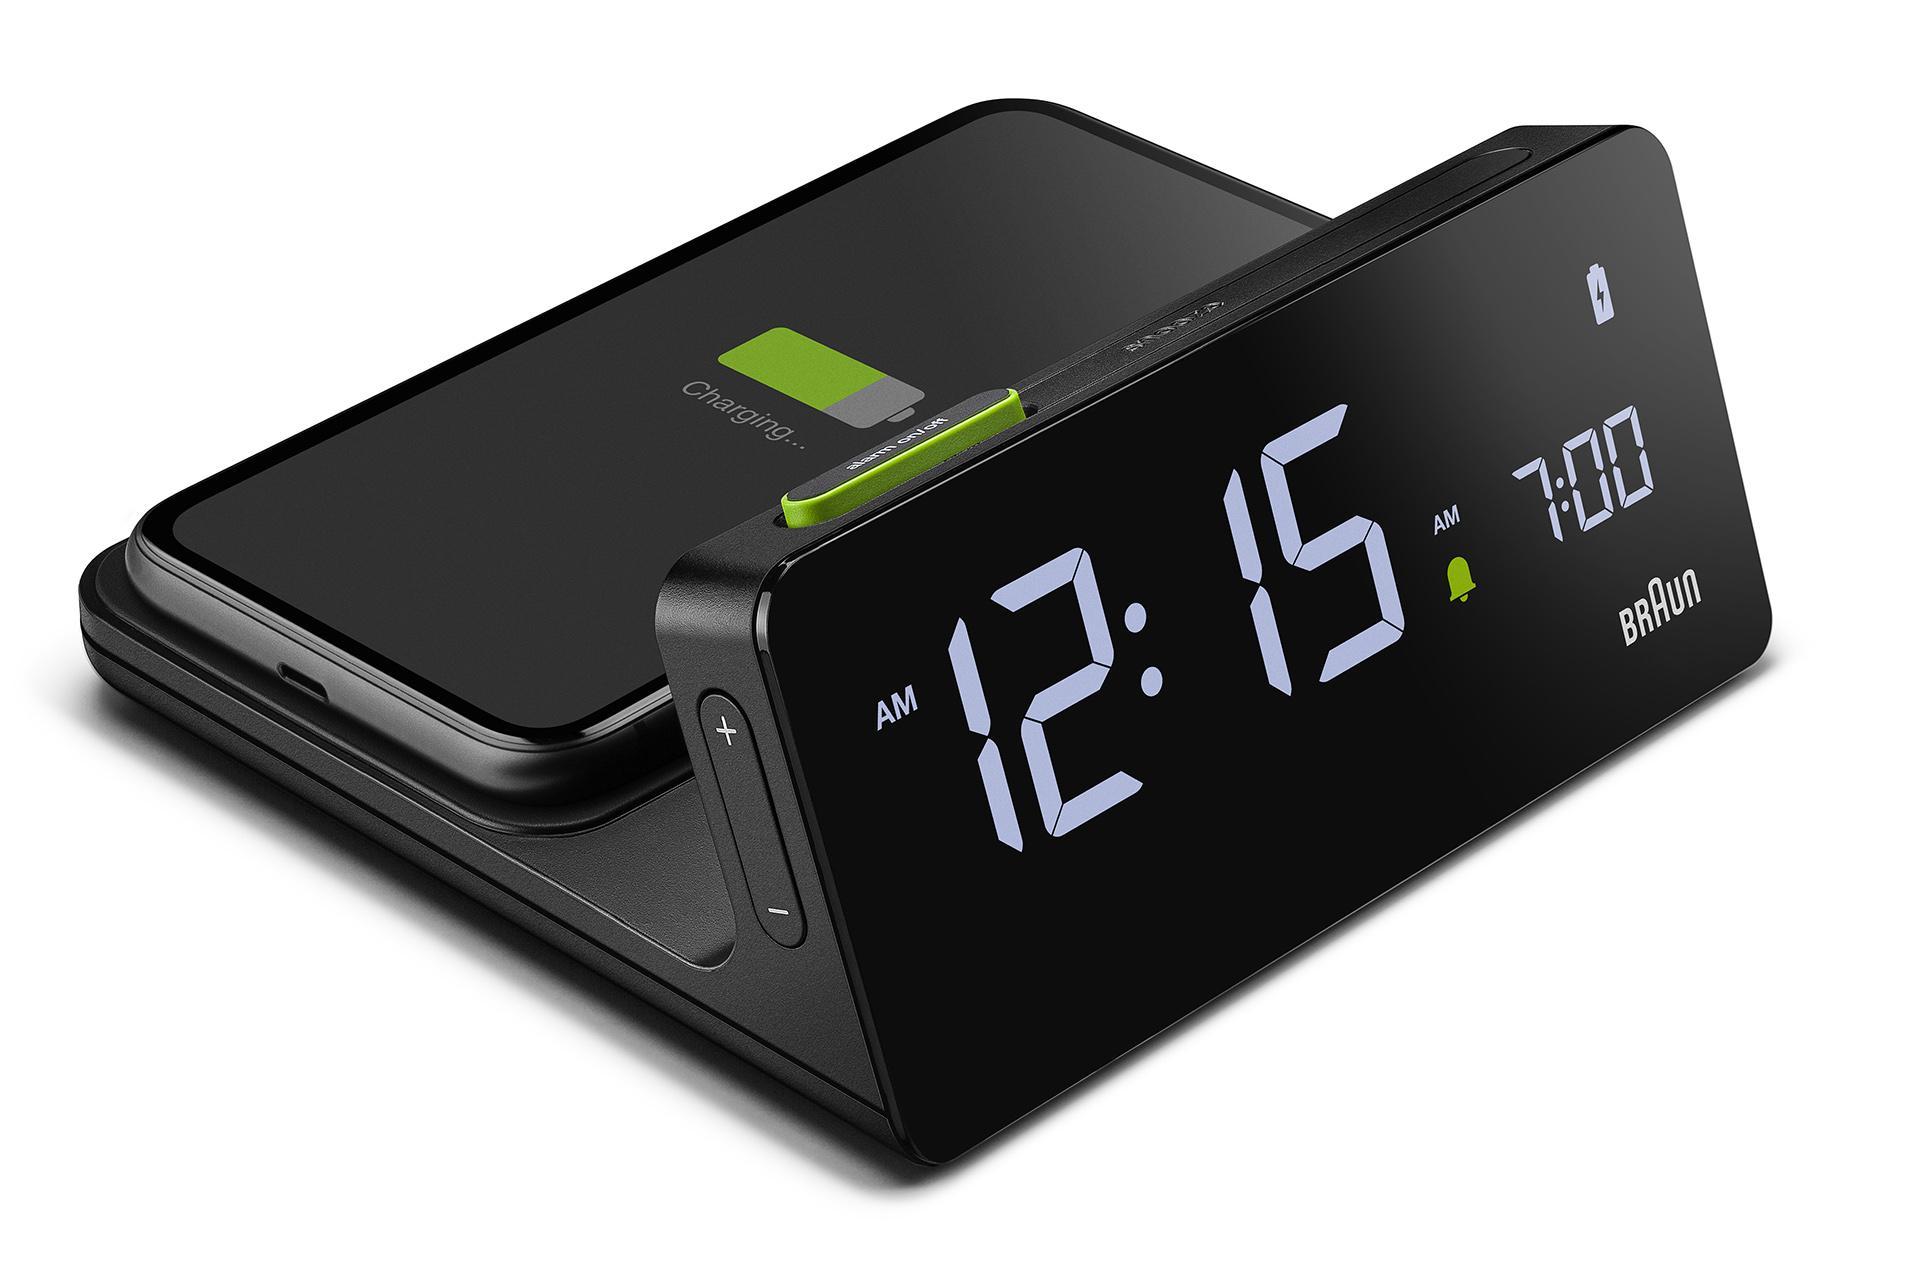 Braun travel clock